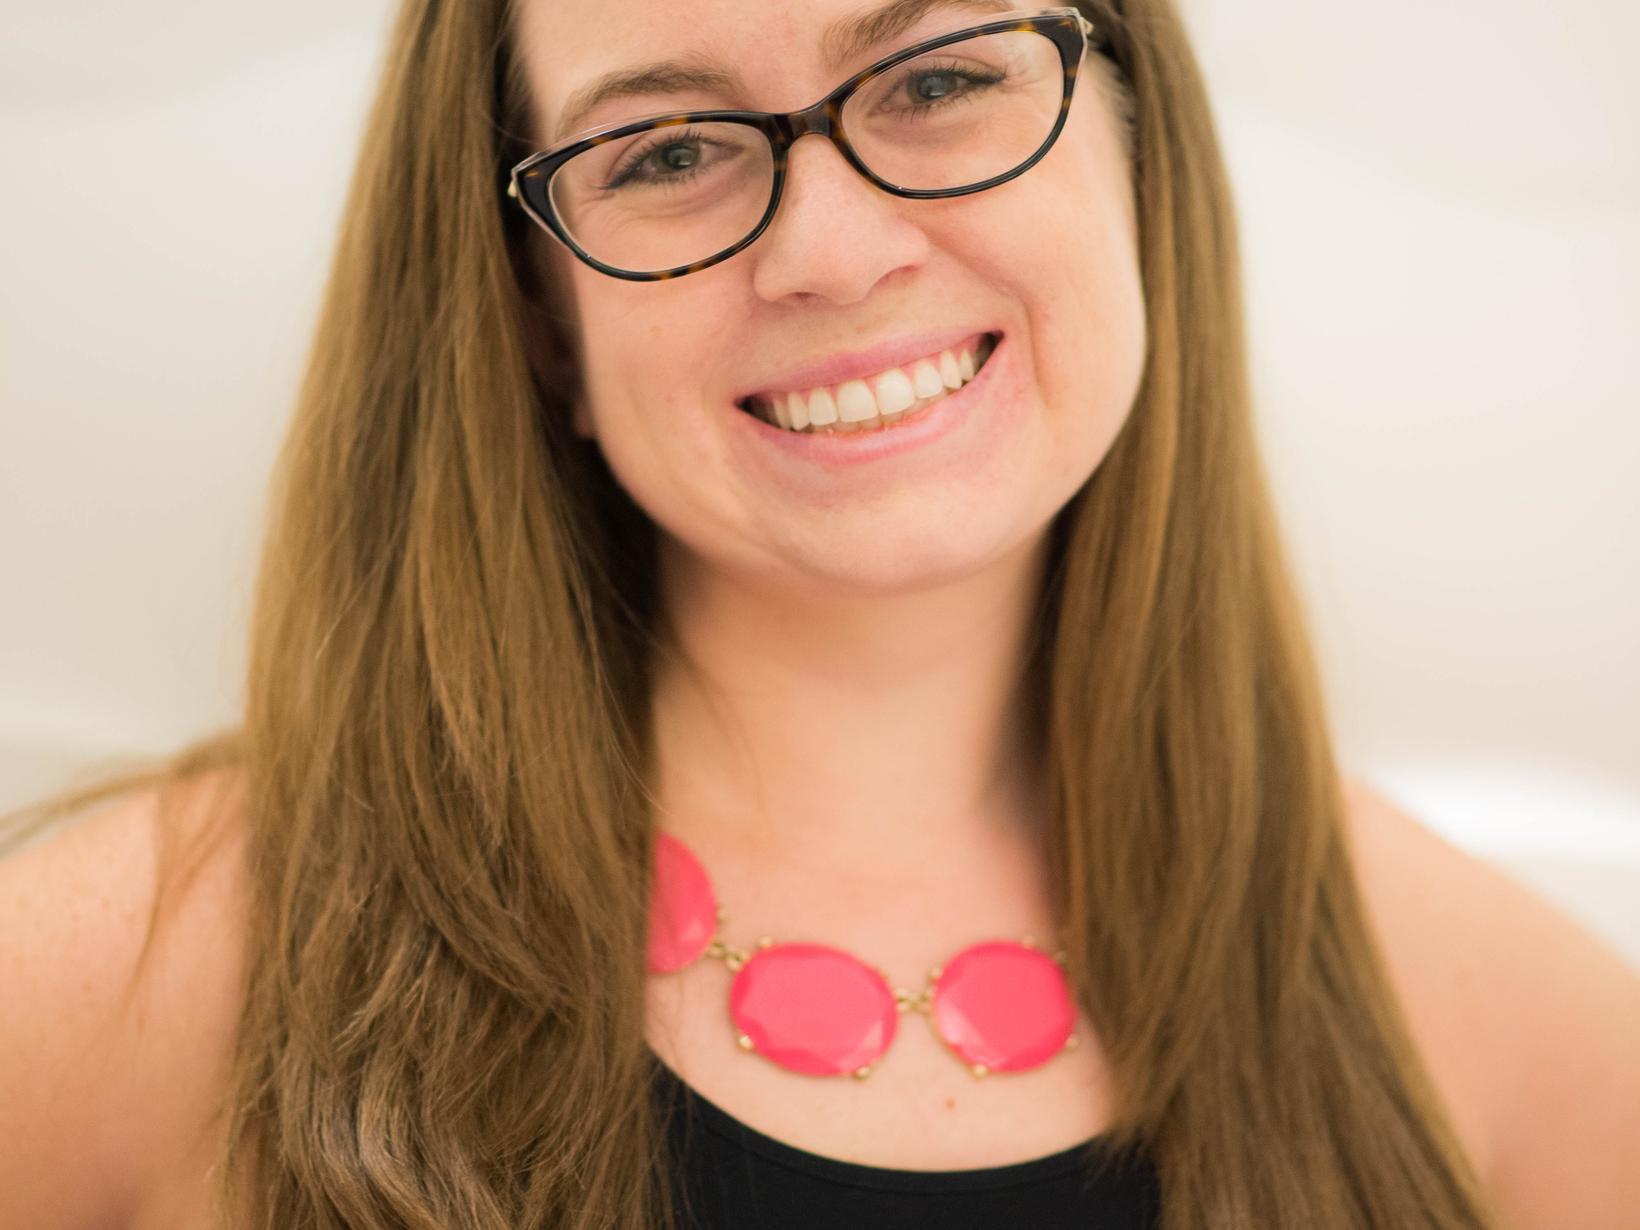 Jenna from Philadelphia, Pennsylvania, United States